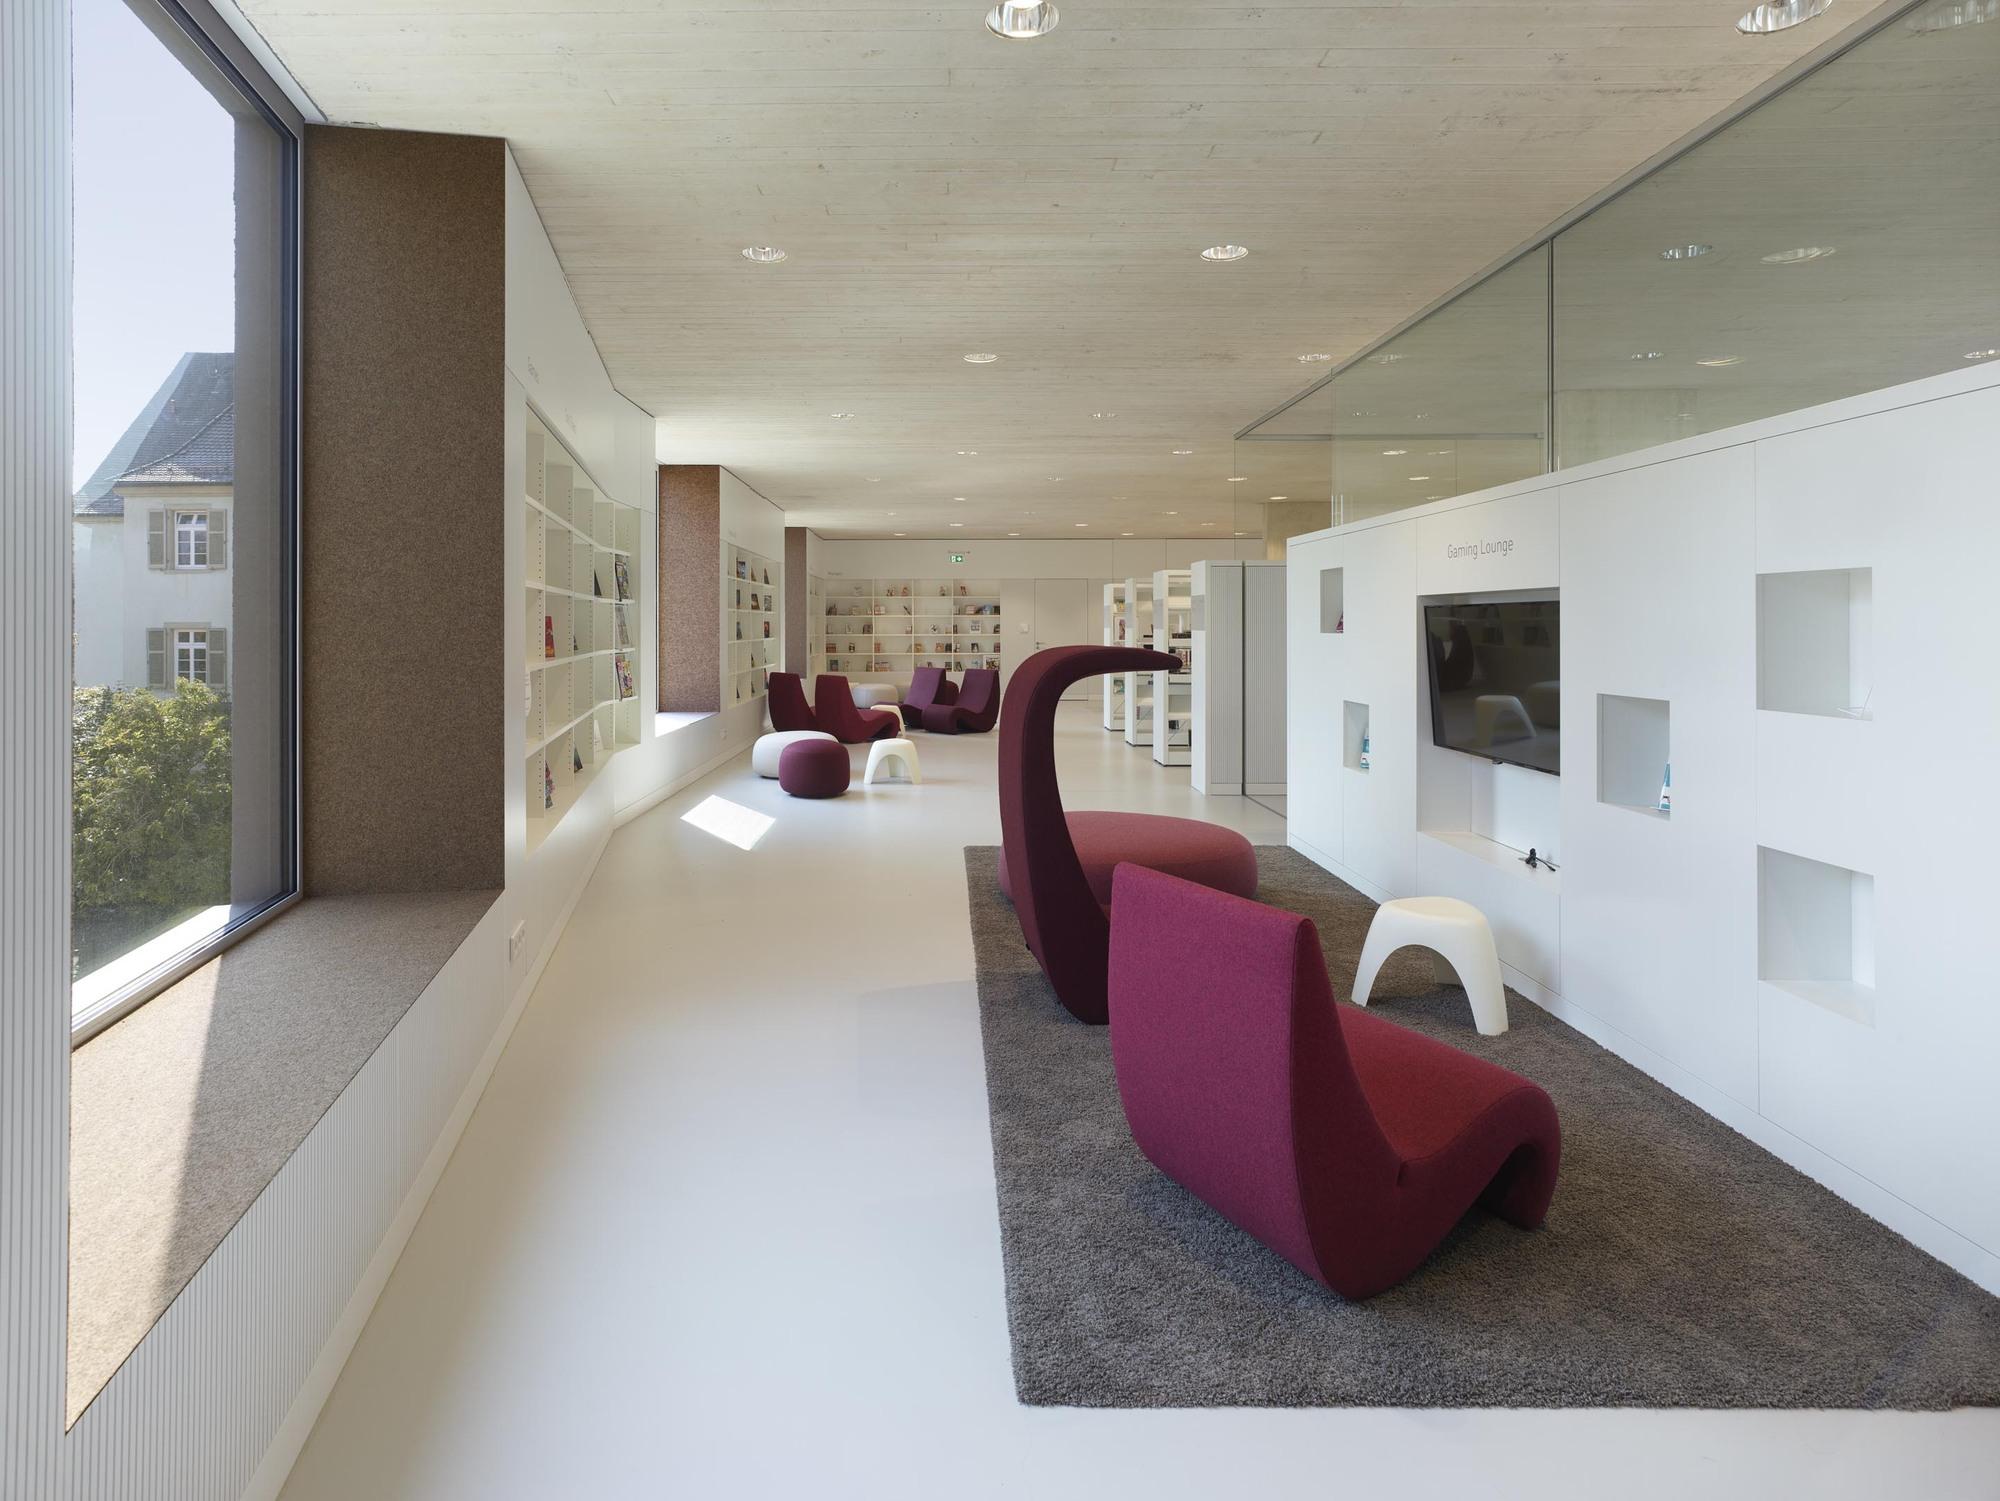 Gallery of City Library Rottenburg / harris + kurrle architekten bda - 6